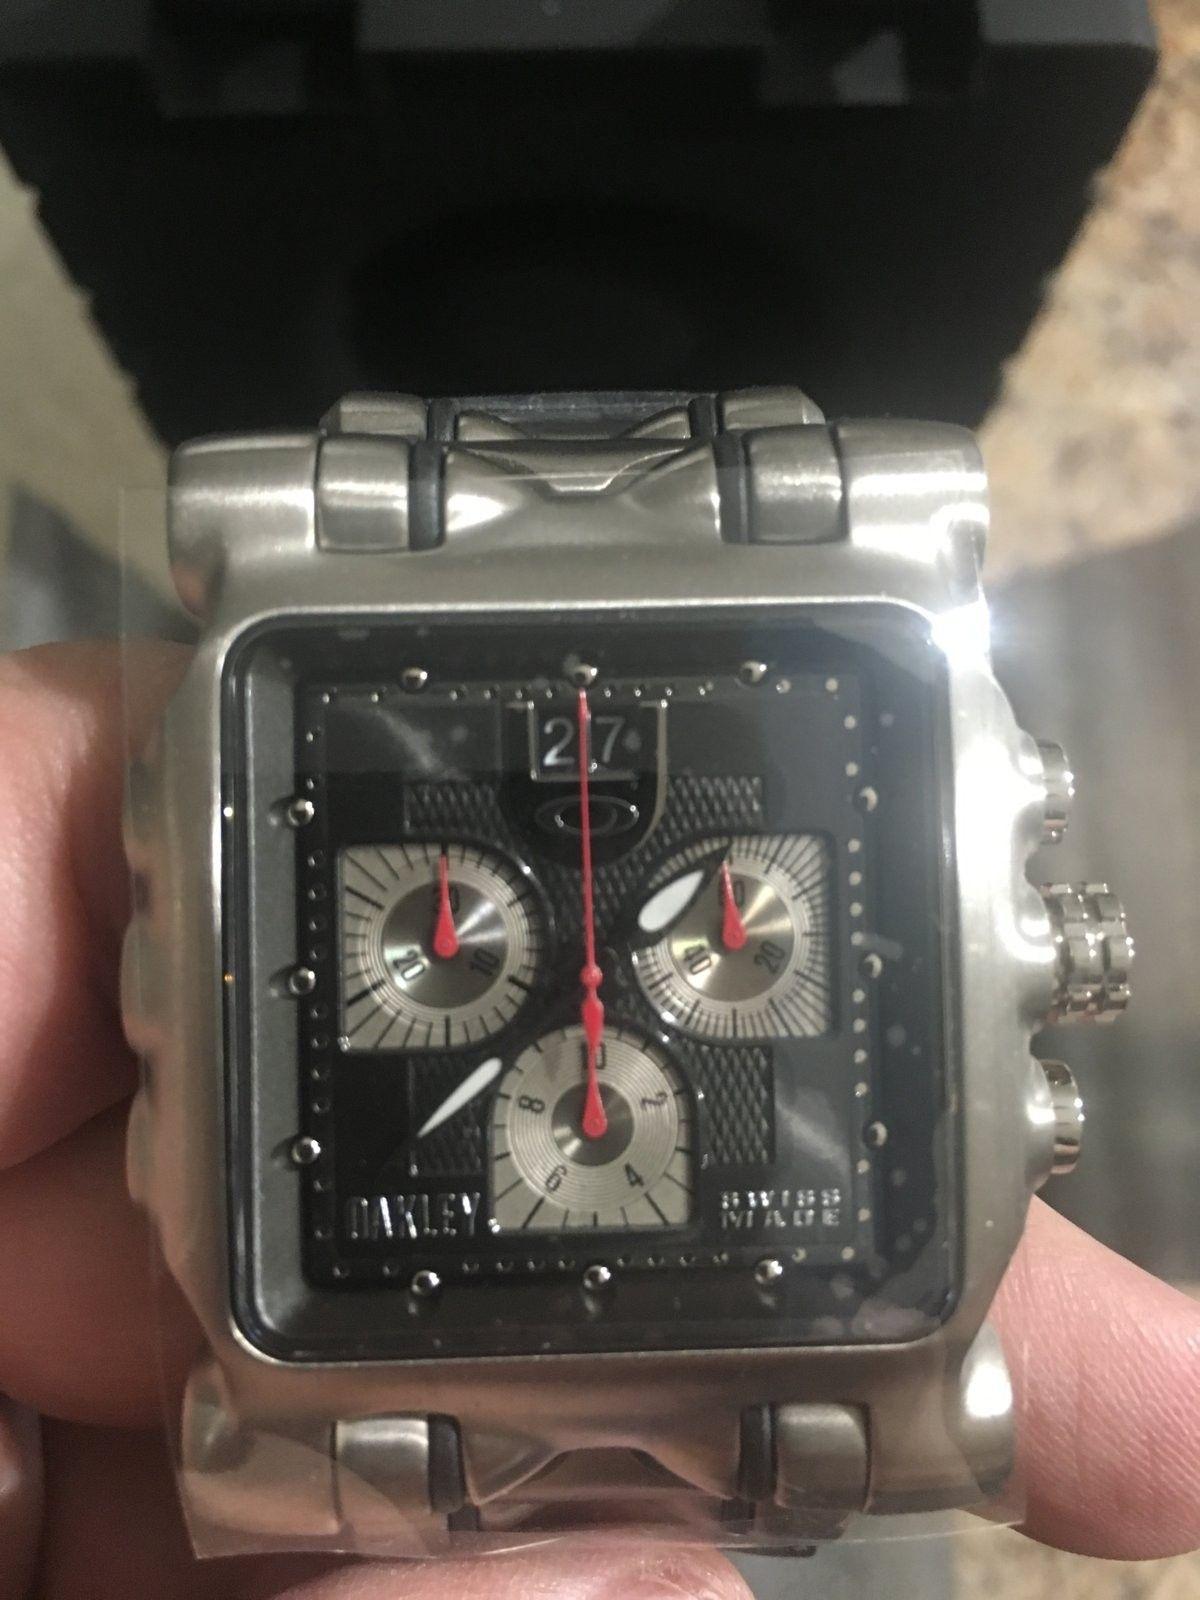 BNIB Black Face MM(Minute Machine) - IMG_1045.JPG